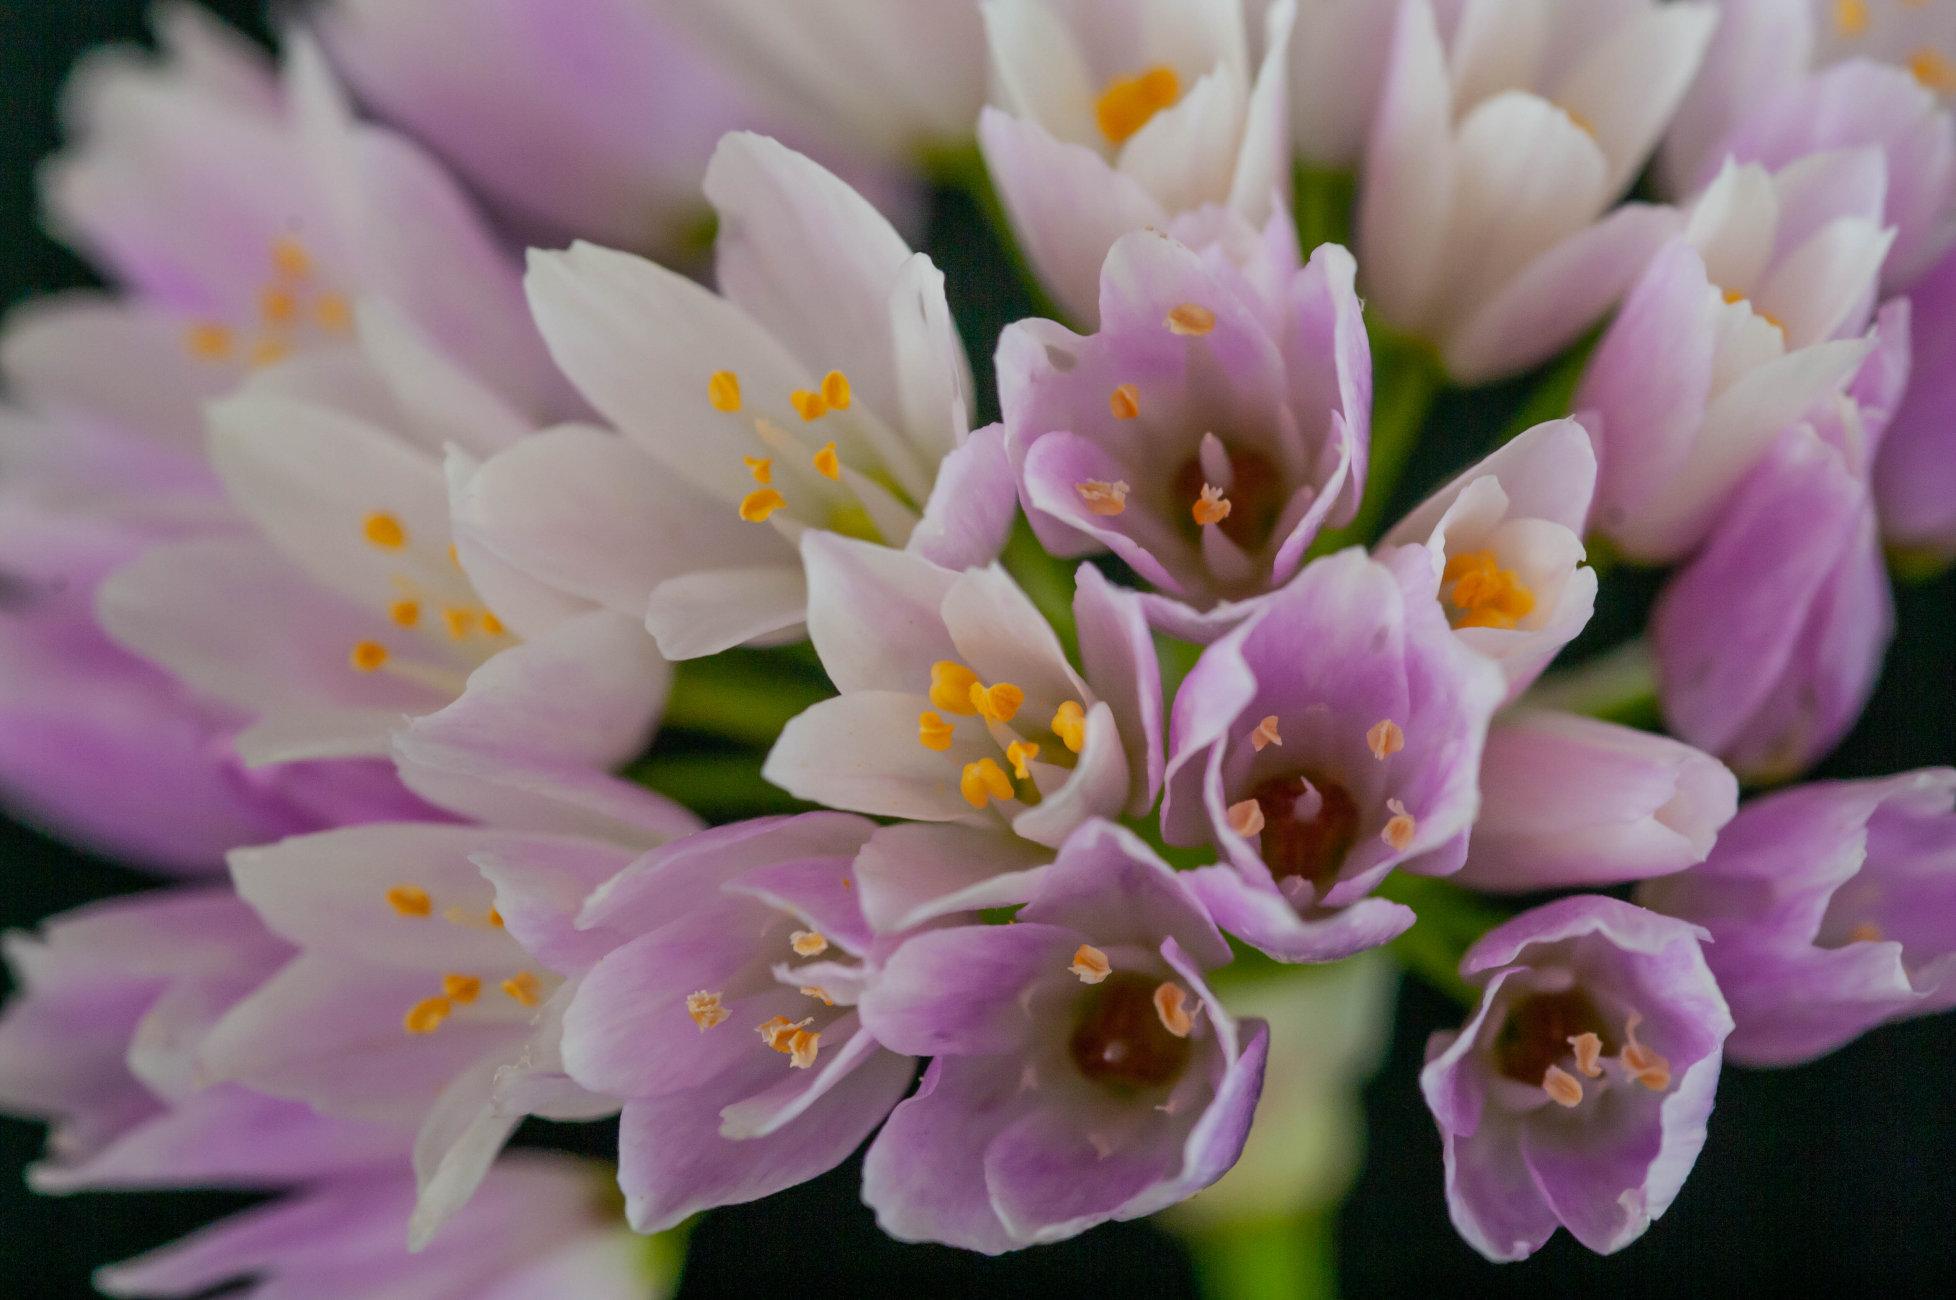 Wild garlic blossoms